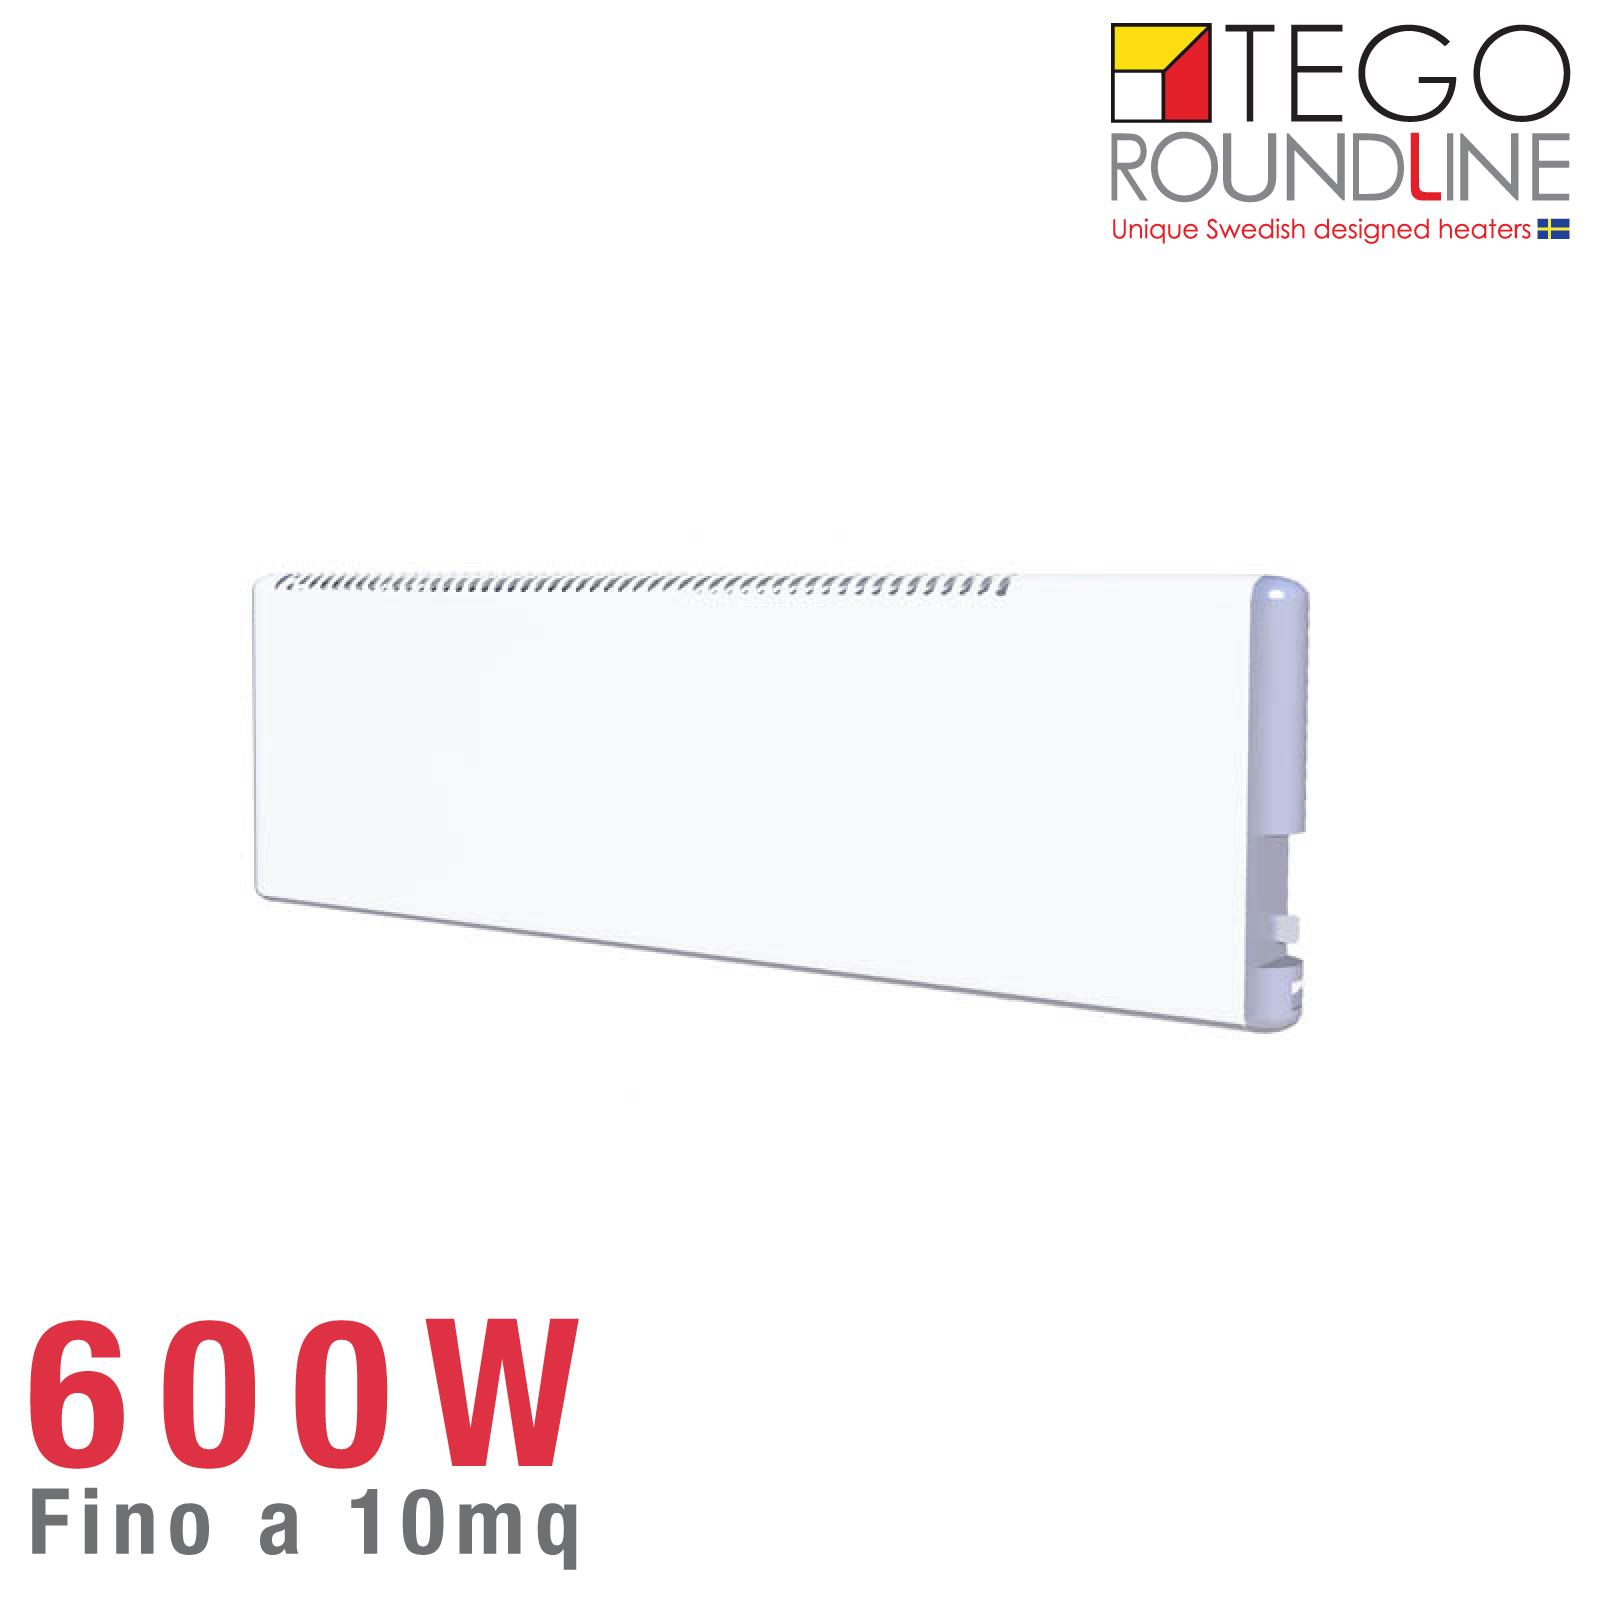 IoRisparmioEnergia-Radiatore-Elettrico-Svedese-TEGO-2019-E8511666-600W